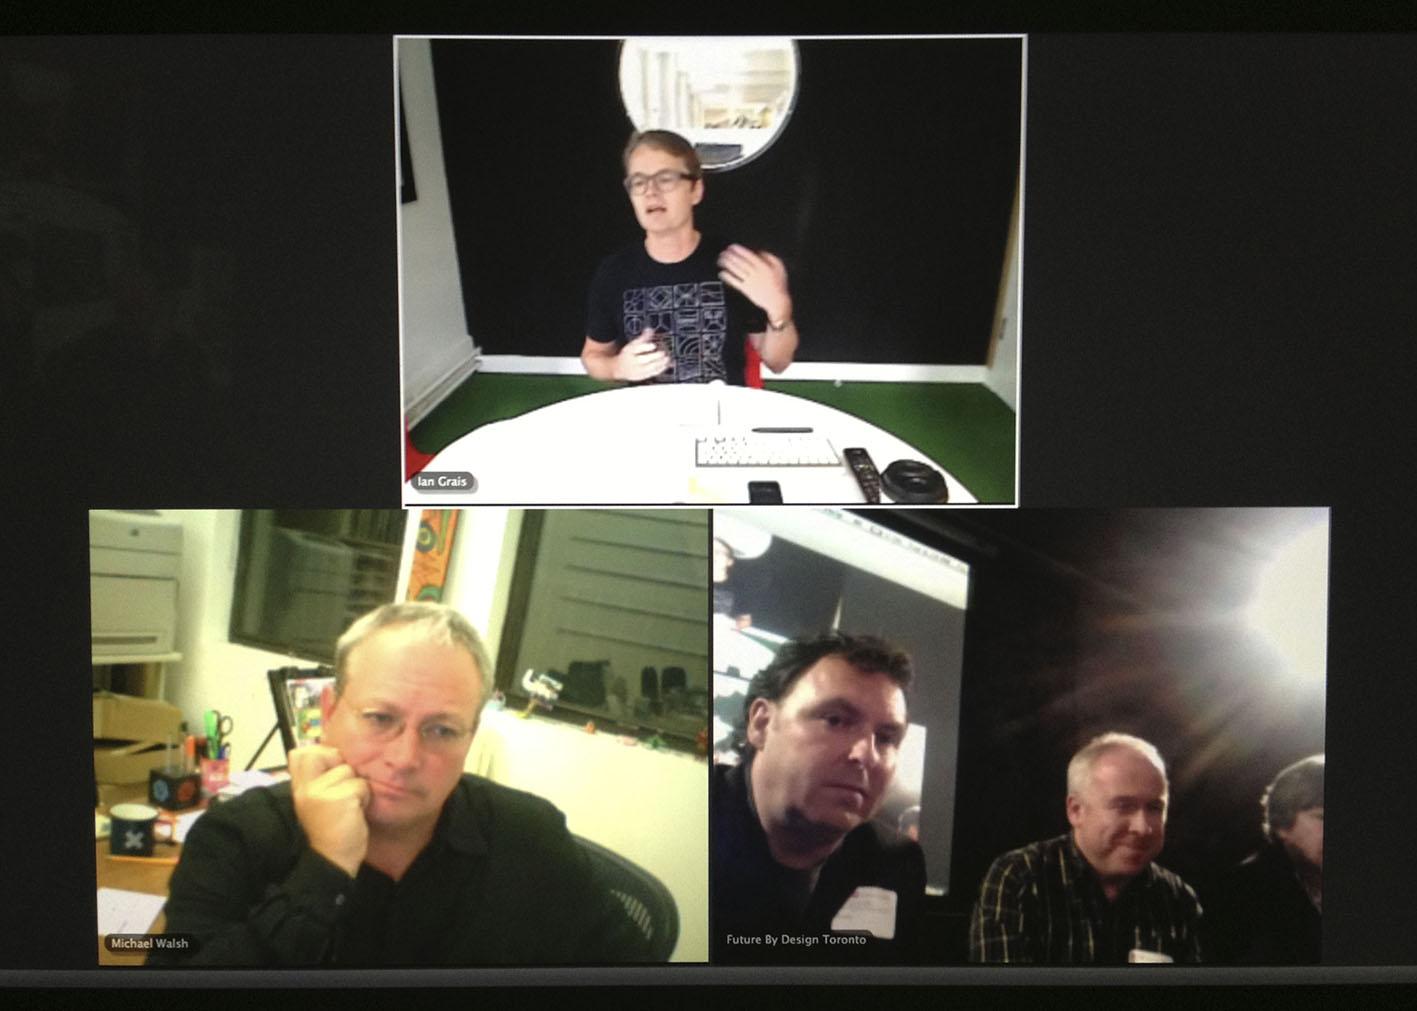 RGD webcast